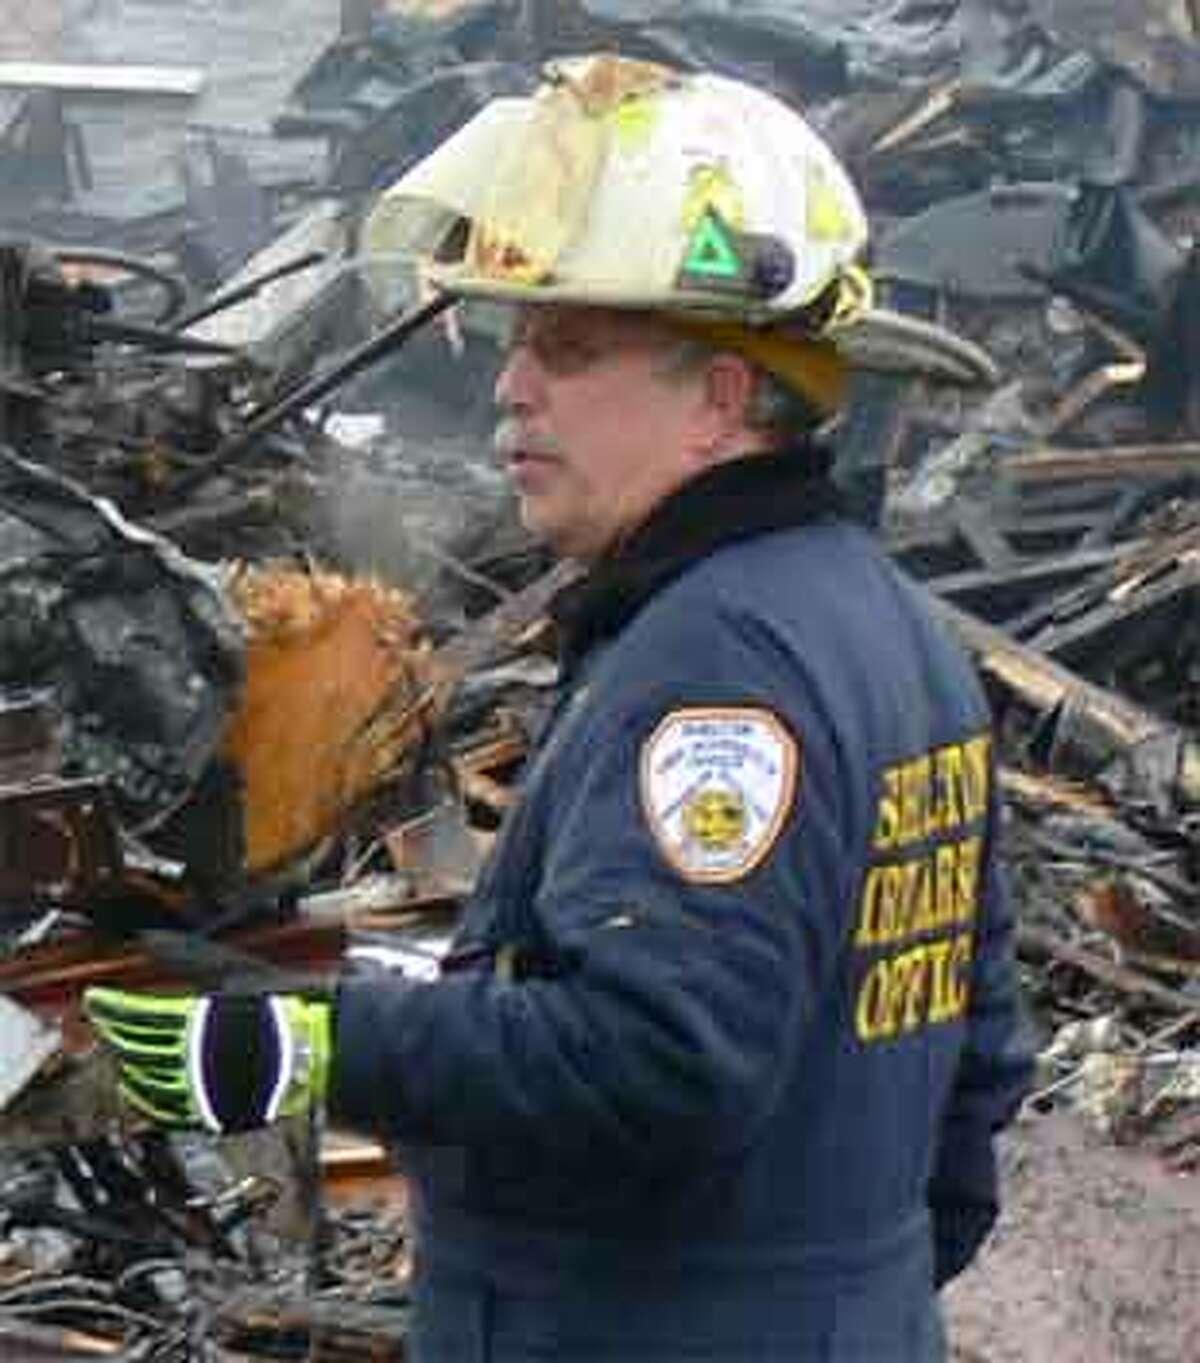 Shelton Fire Marshal James Tortora at a major fire scene.